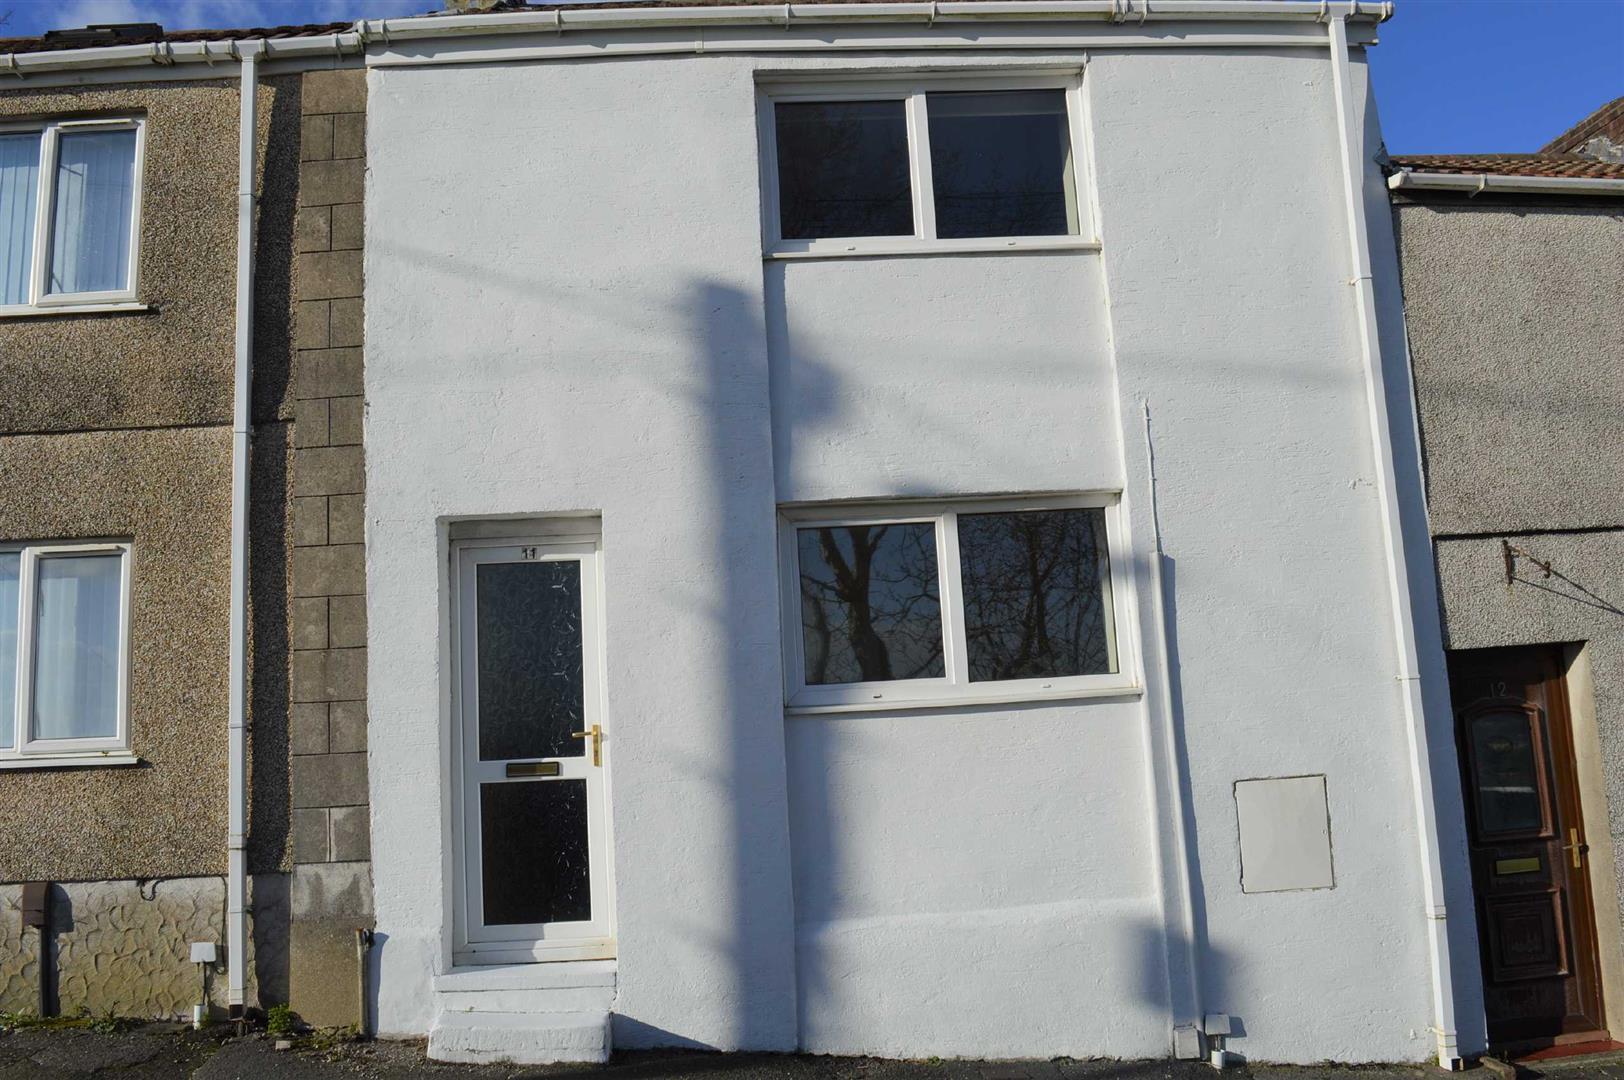 Fullers Row, Mount Pleasant, Swansea, SA1 6YW